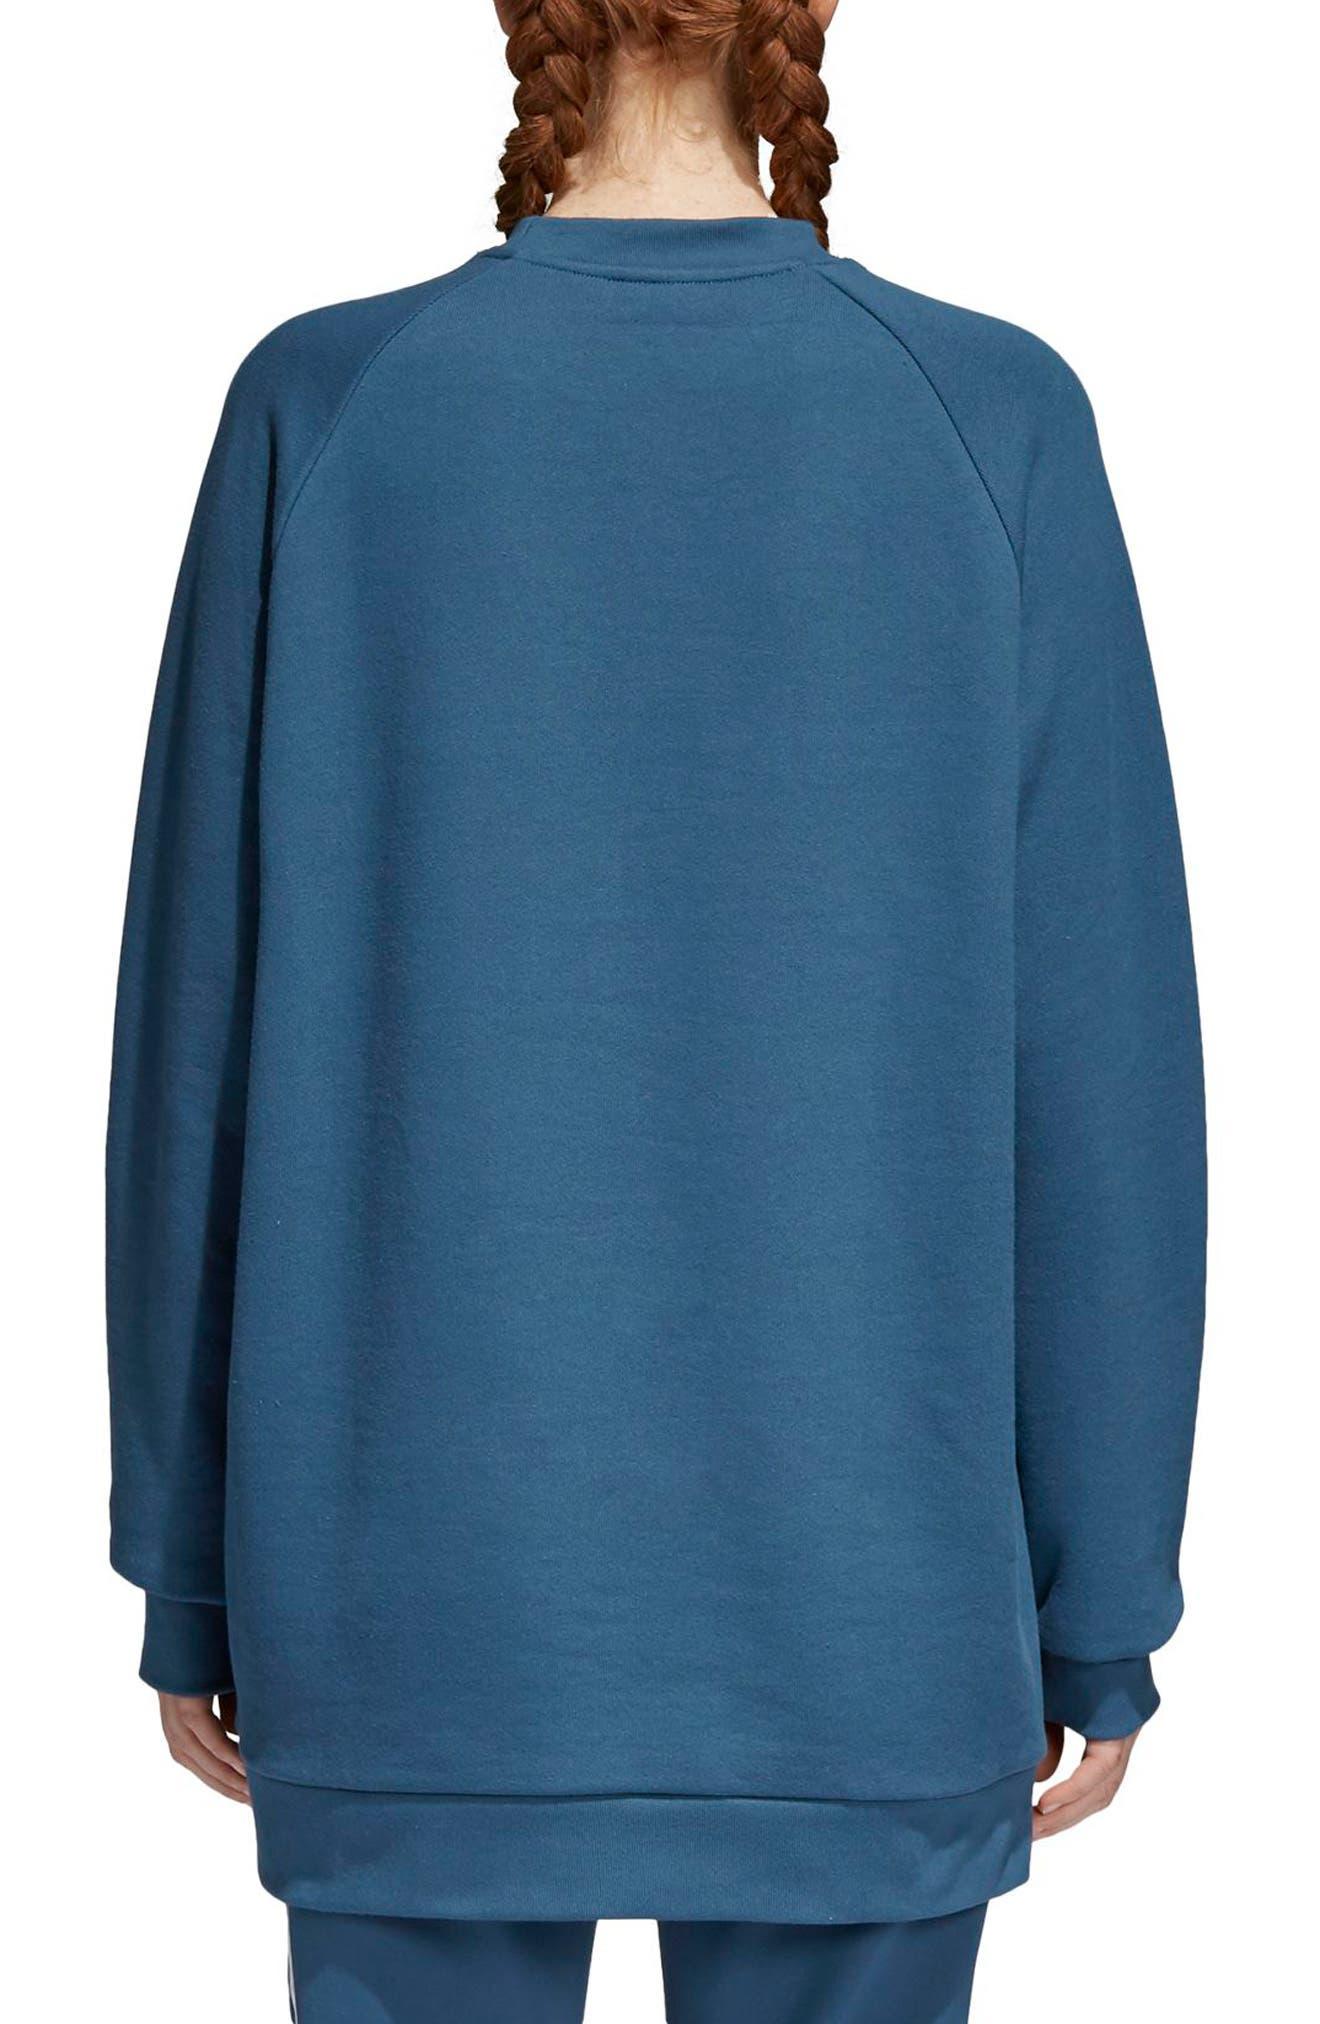 Originals Oversize Sweatshirt,                             Alternate thumbnail 2, color,                             020